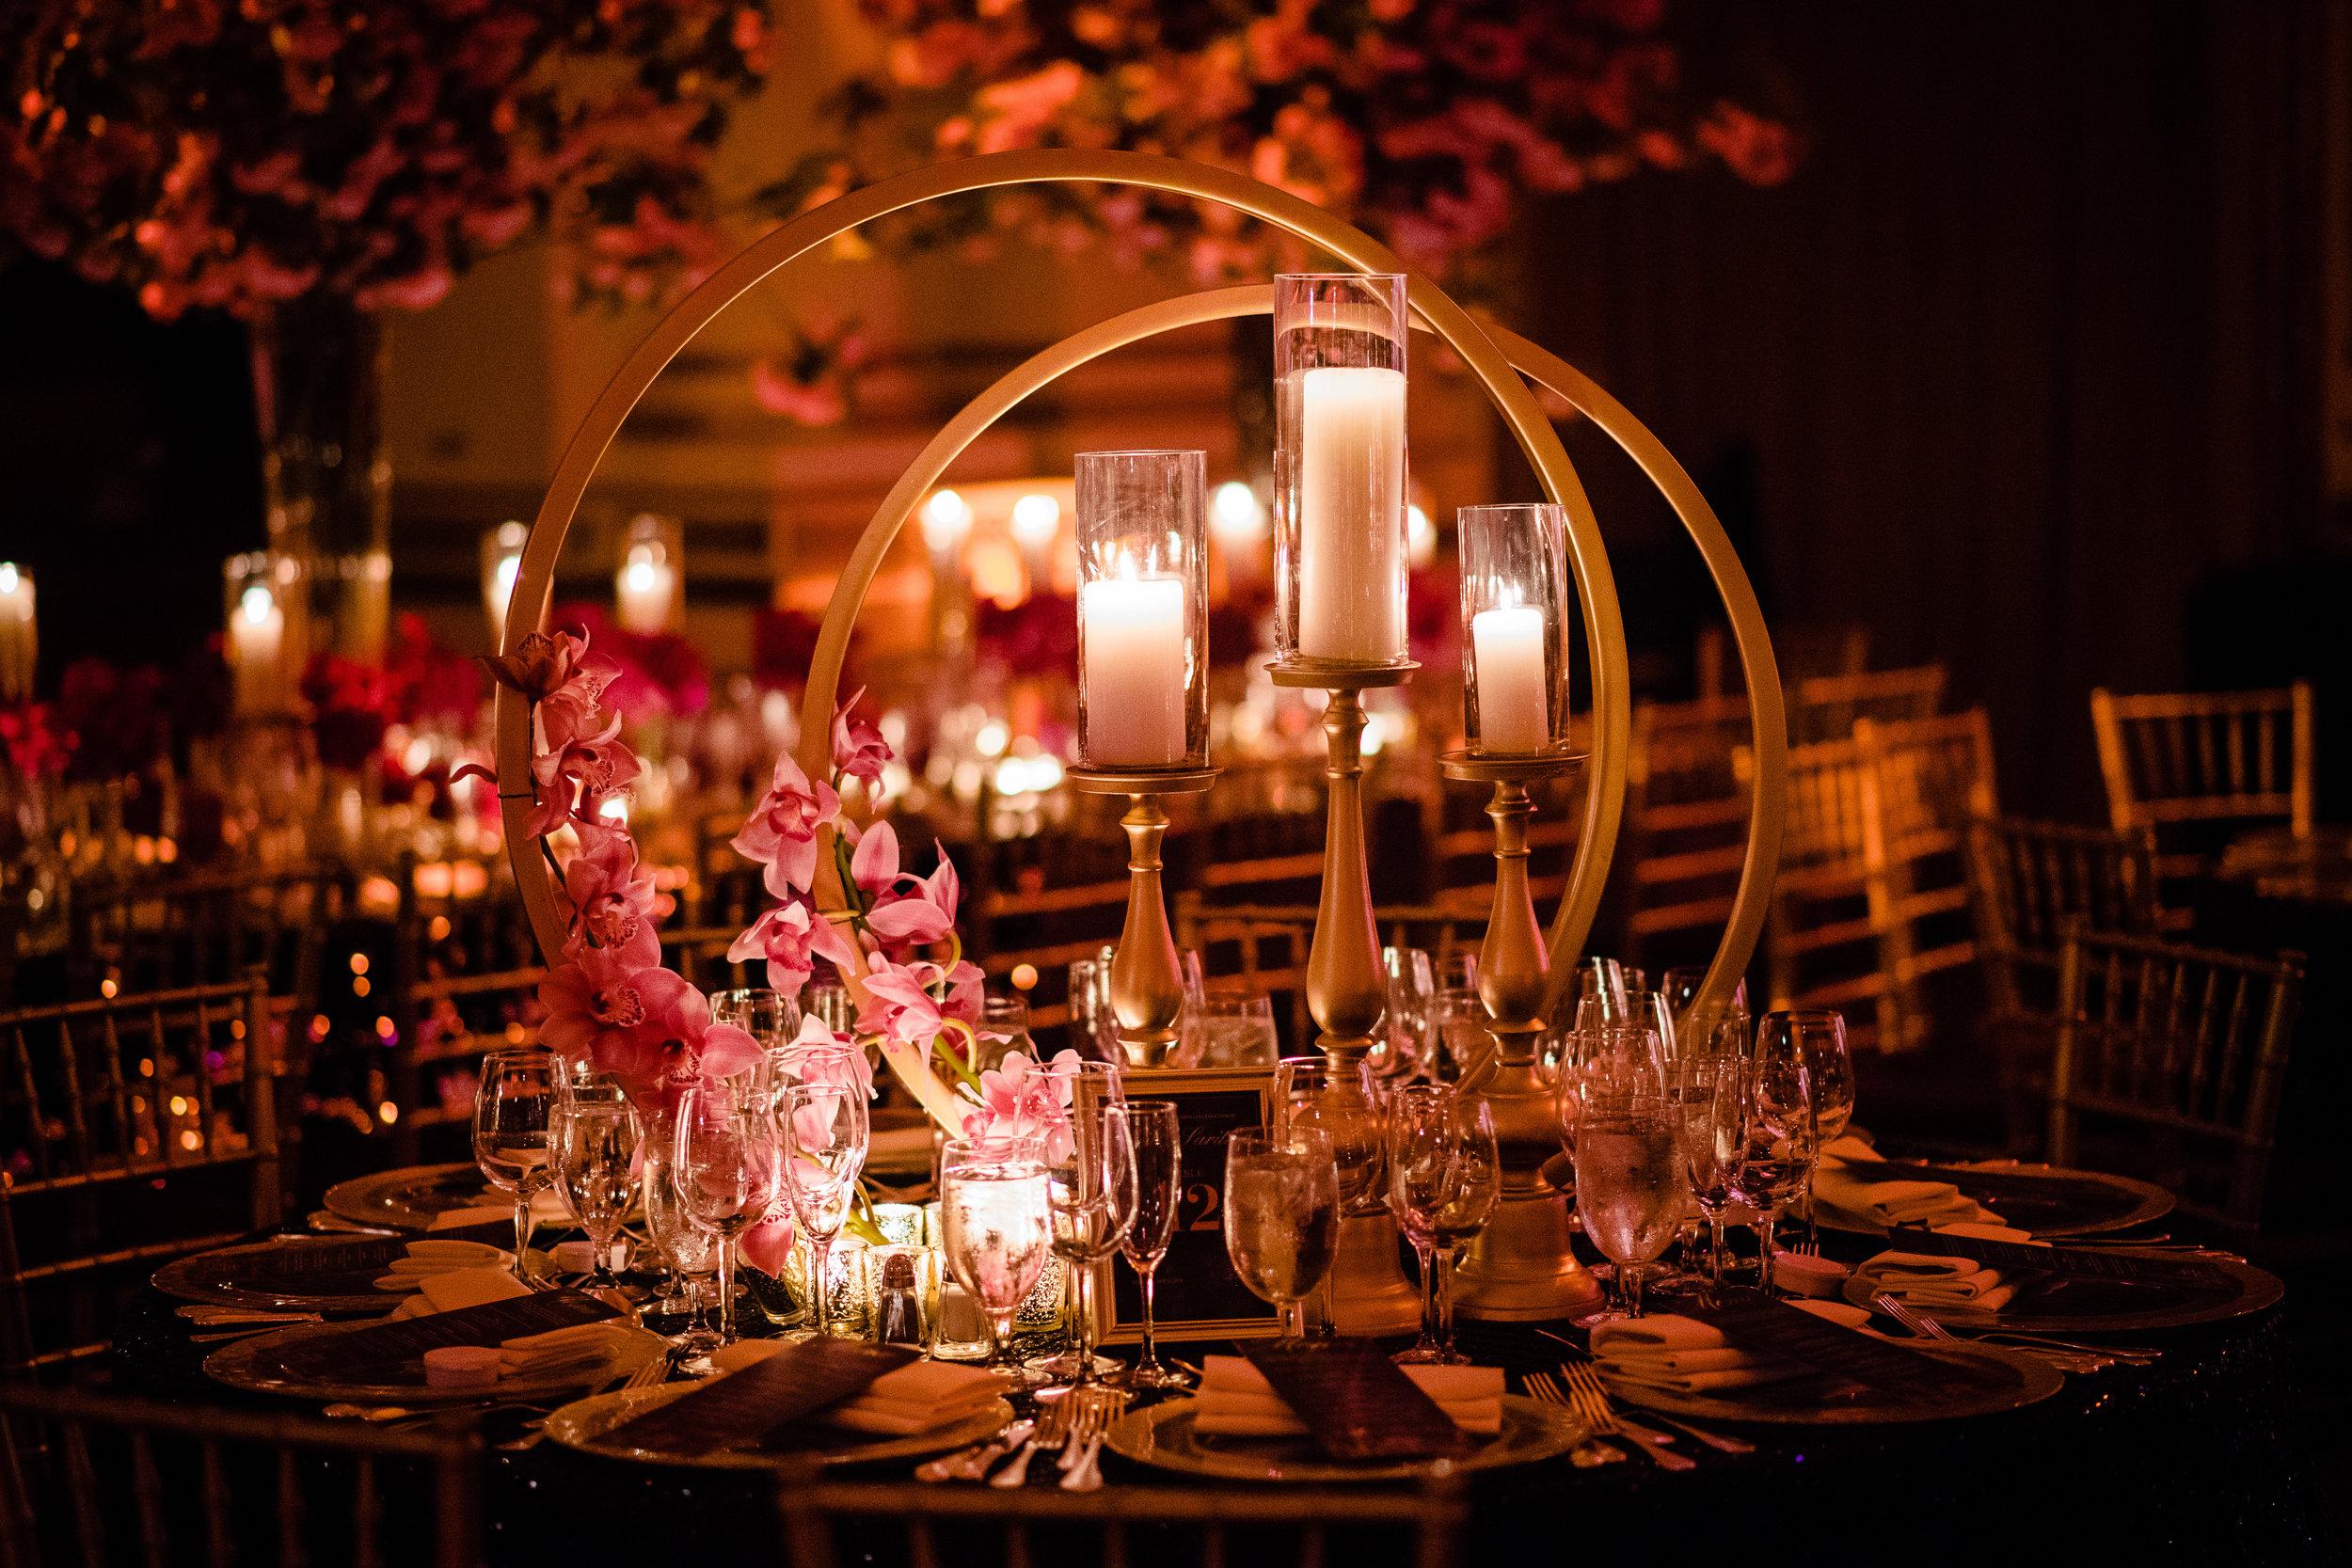 INDIAN WEDDING TABLE CENTERPIECE.jpg